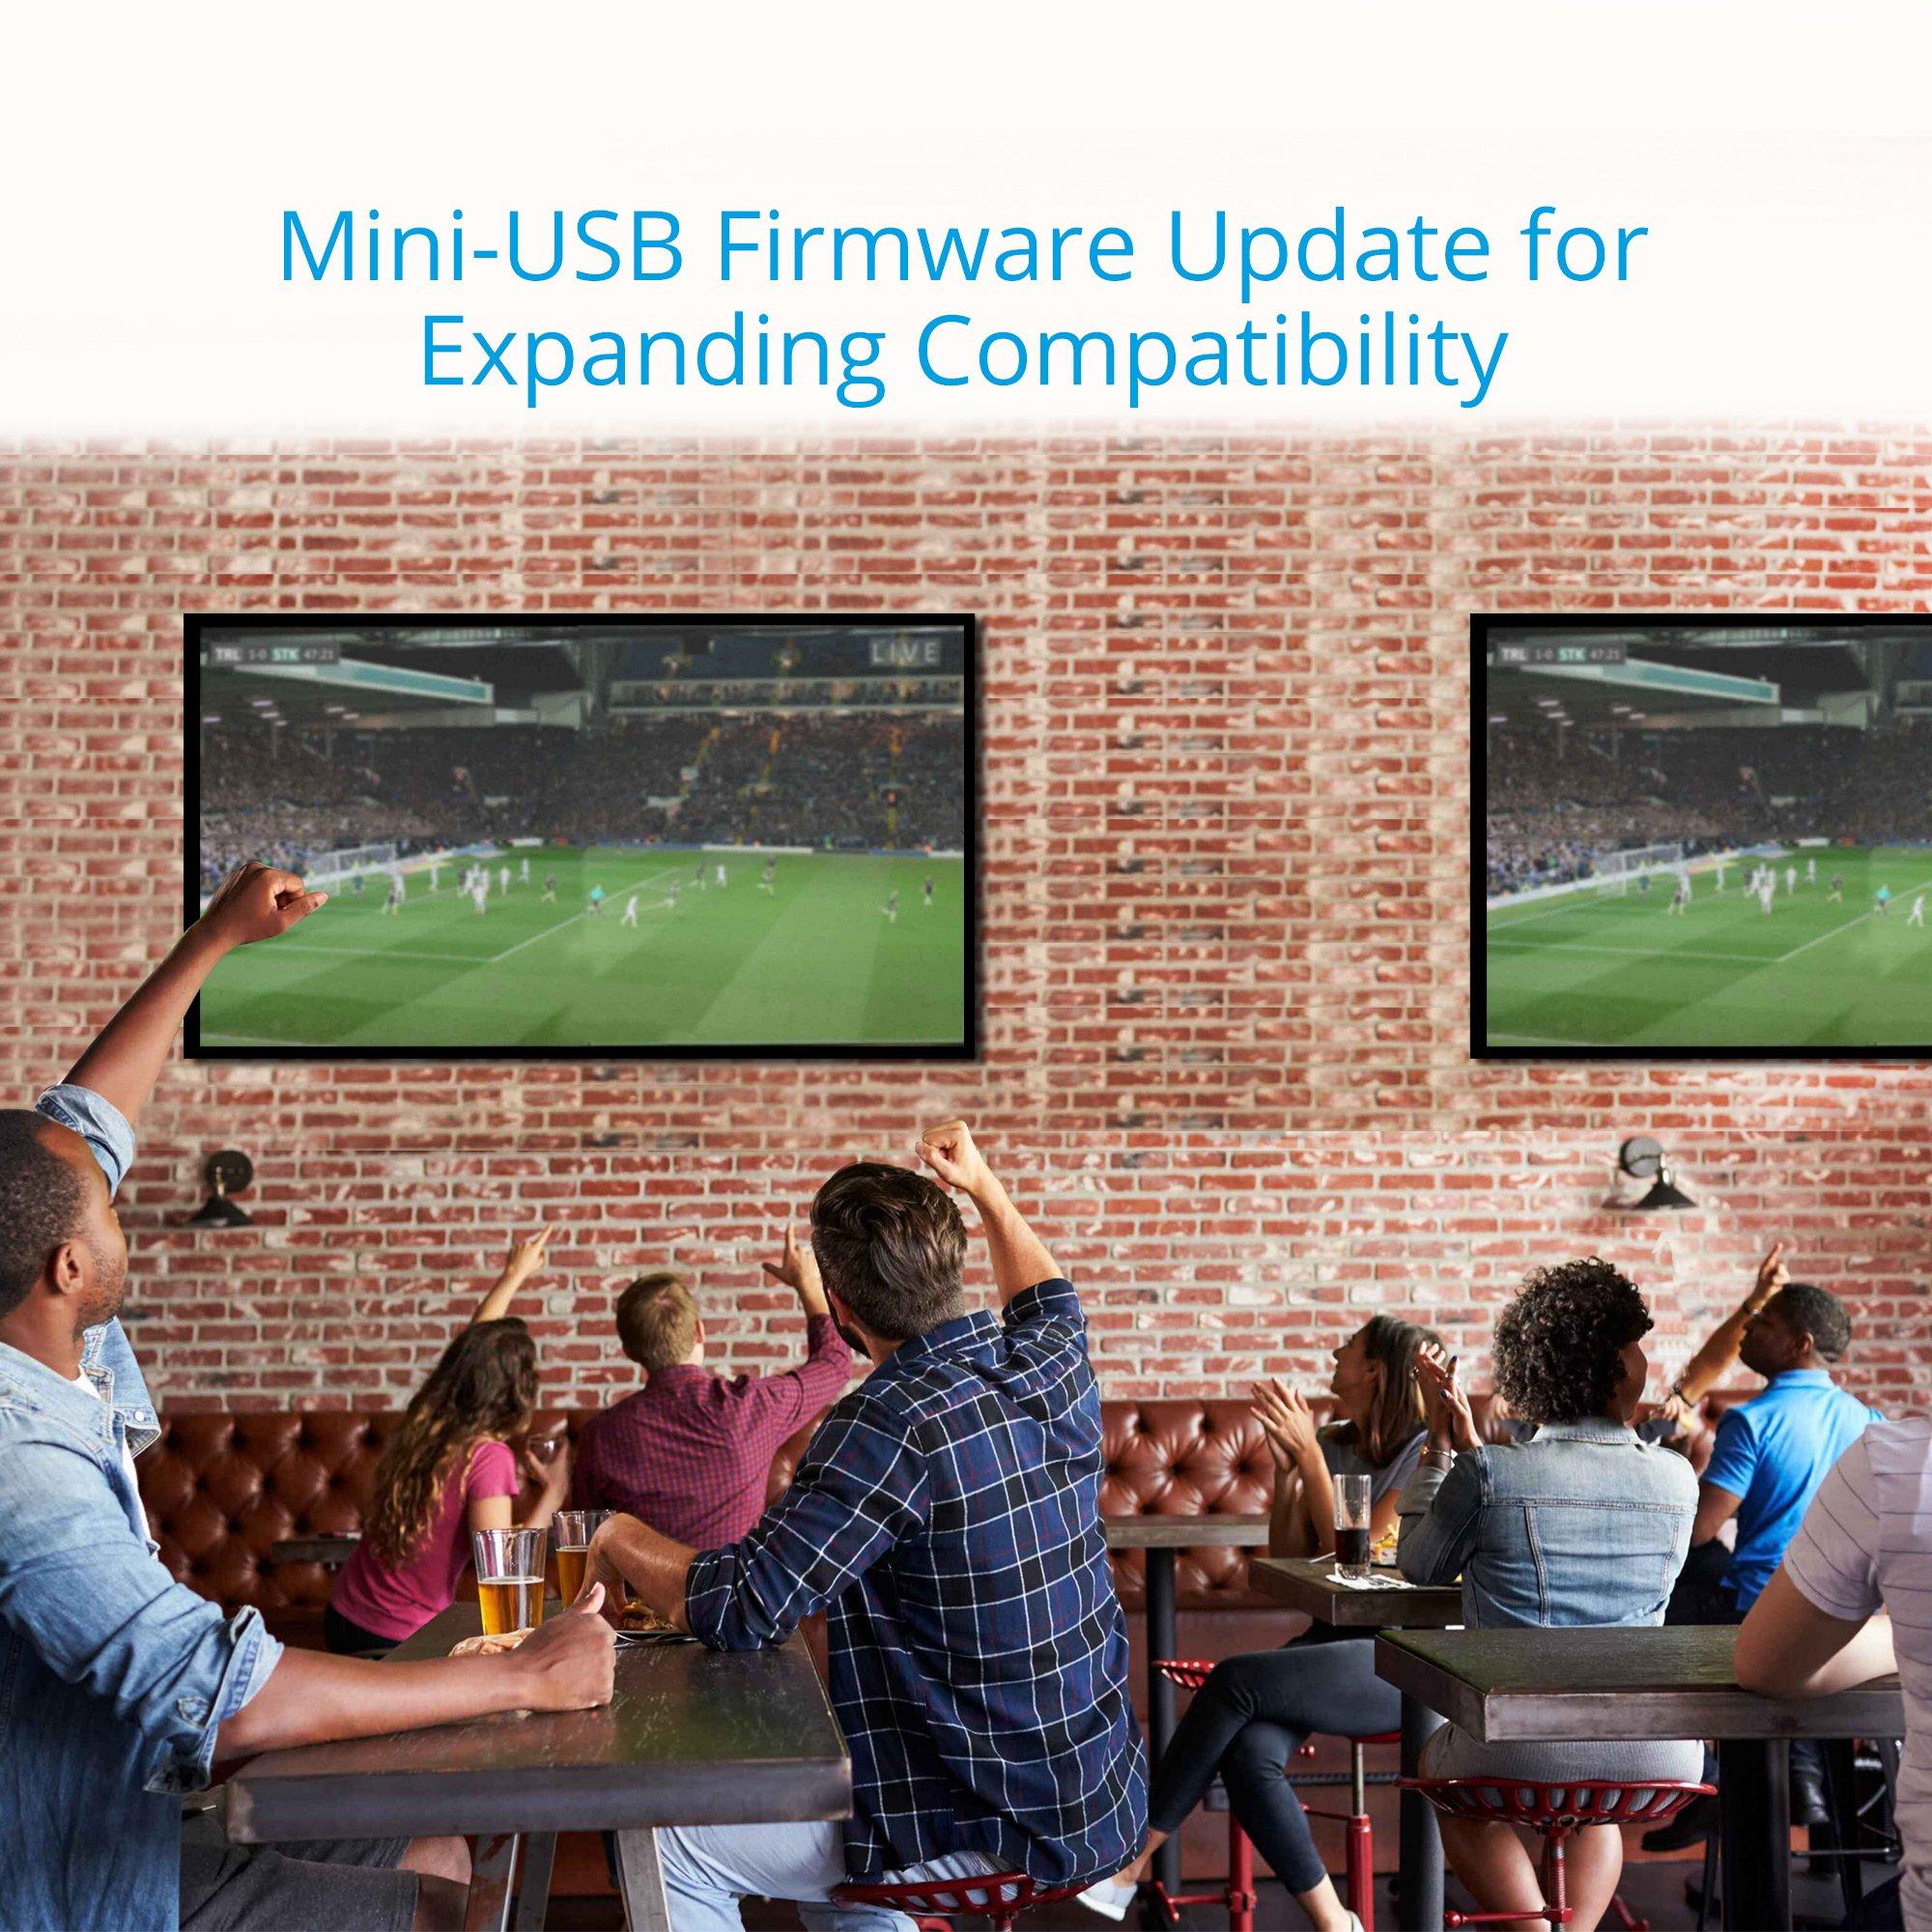 gofanco Prophecy Intelligent 4K 60Hz HDR 1x2 HDMI 2 0 Splitter – YUV 4:4:4,  3D, HDMI 2 0a, HDCP 2 2, EDID, 18Gbps, Auto Scaling, Low Heat,